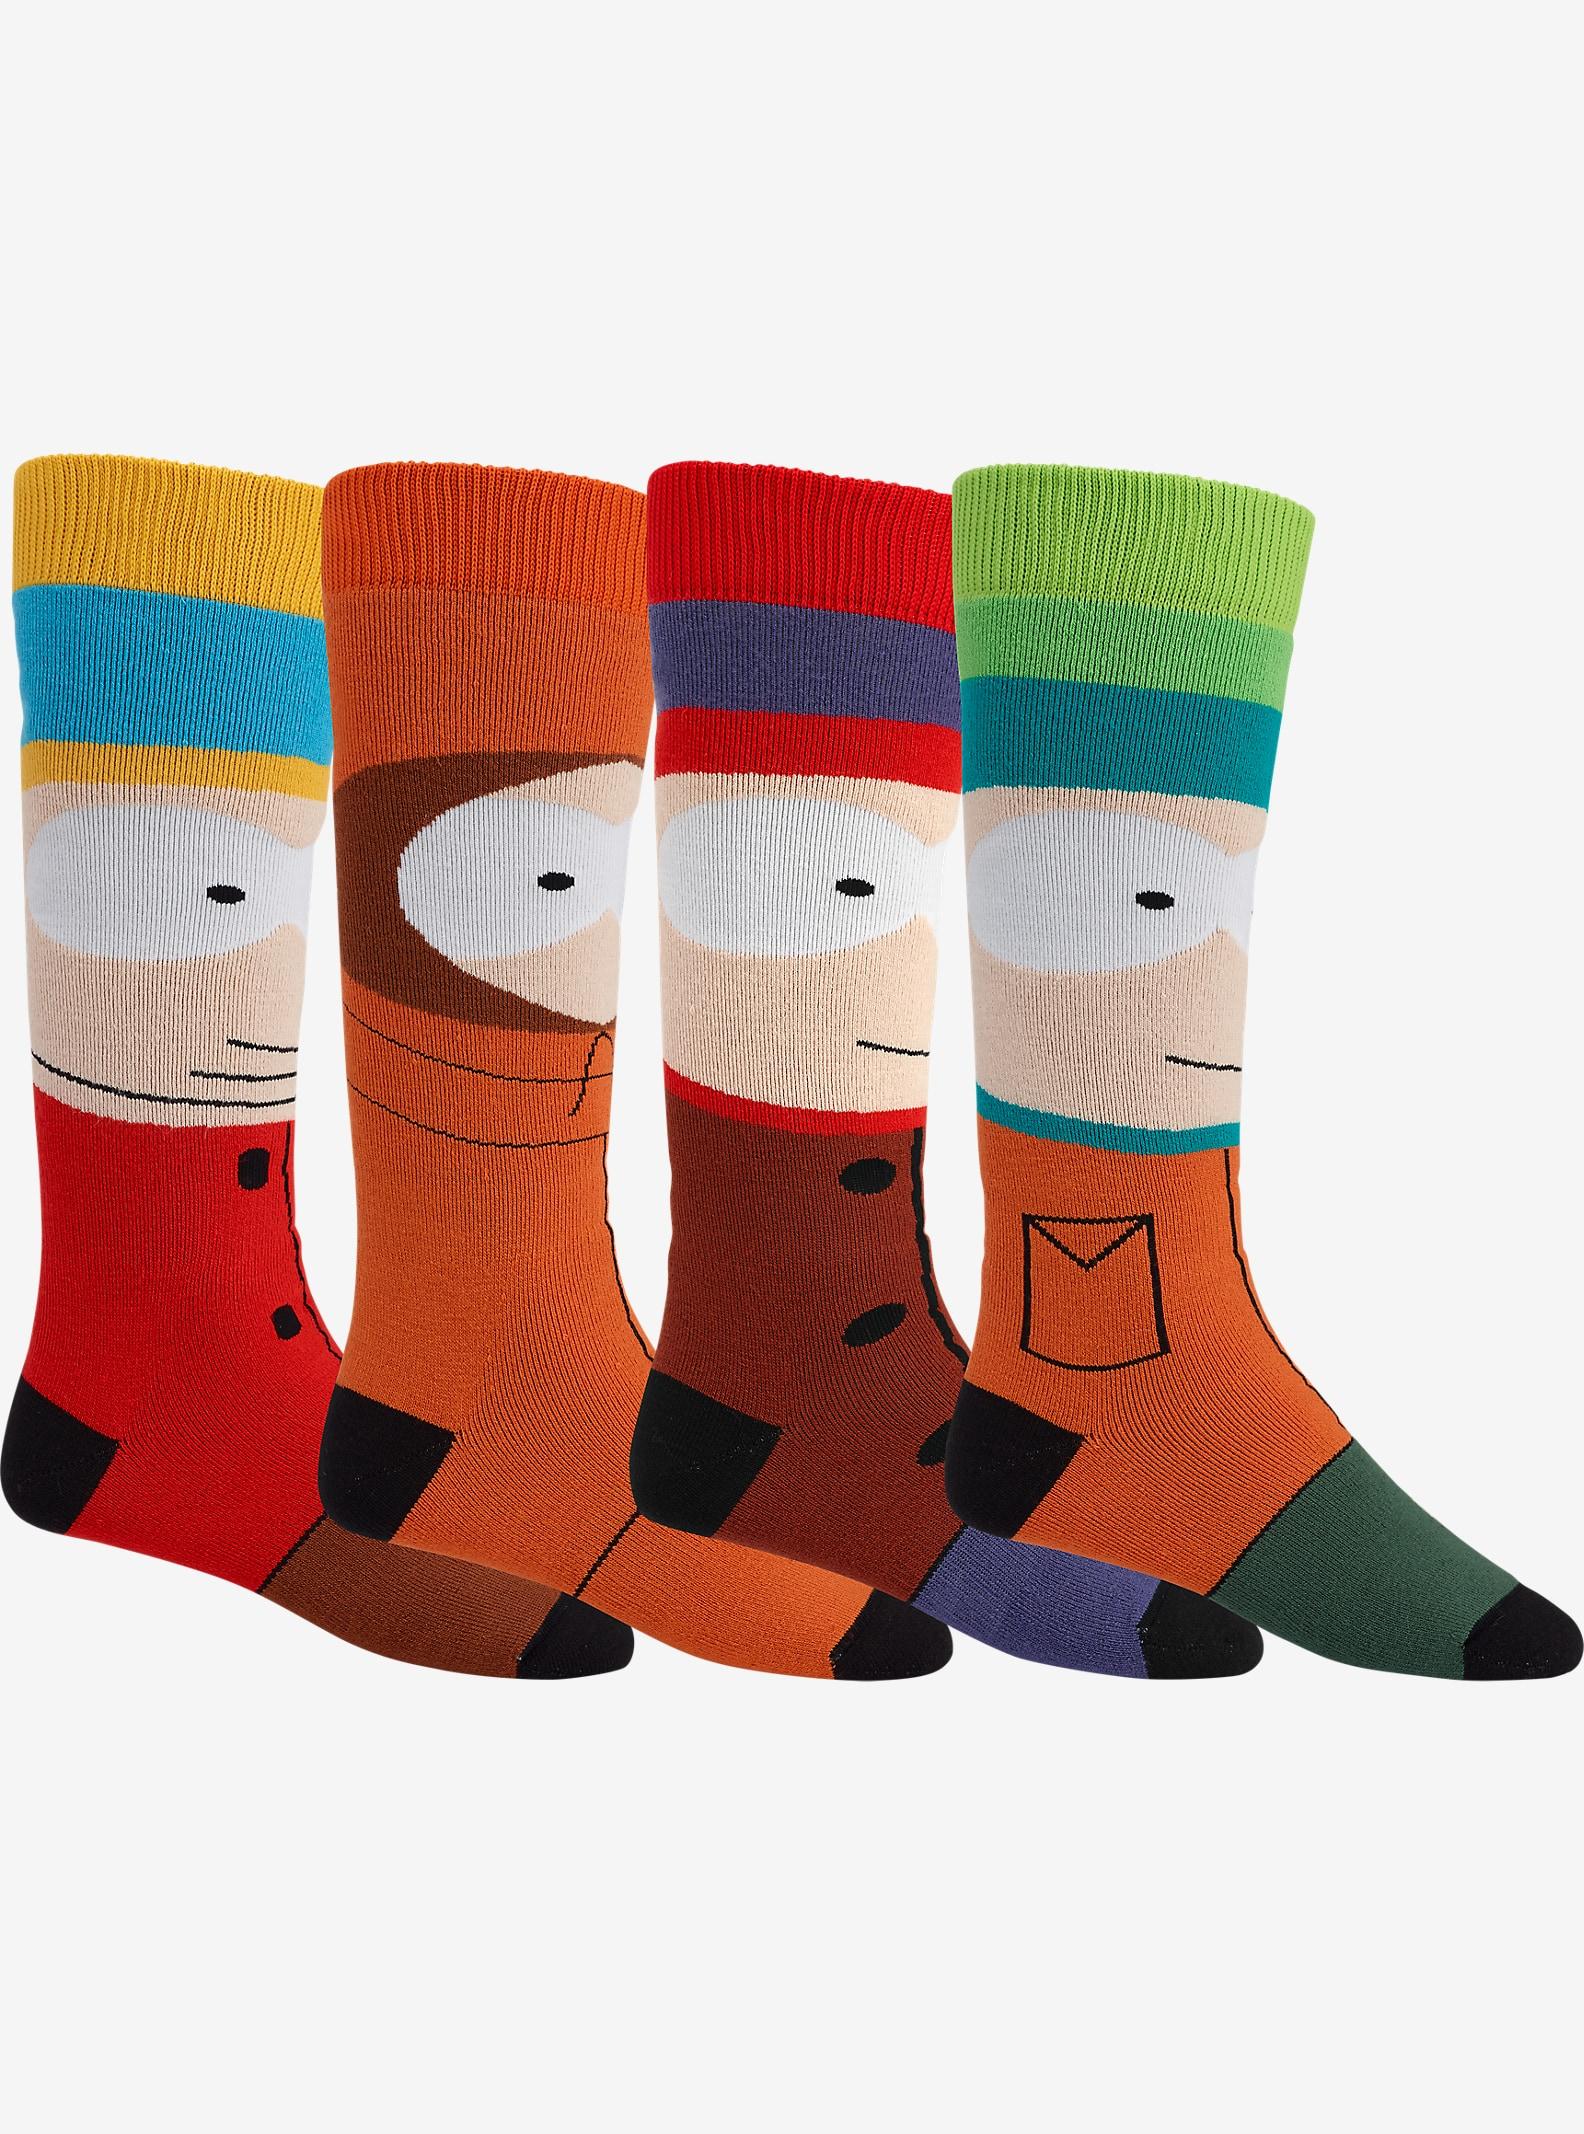 Burton x South Park Weekend Socken im Doppelpack angezeigt in South Park